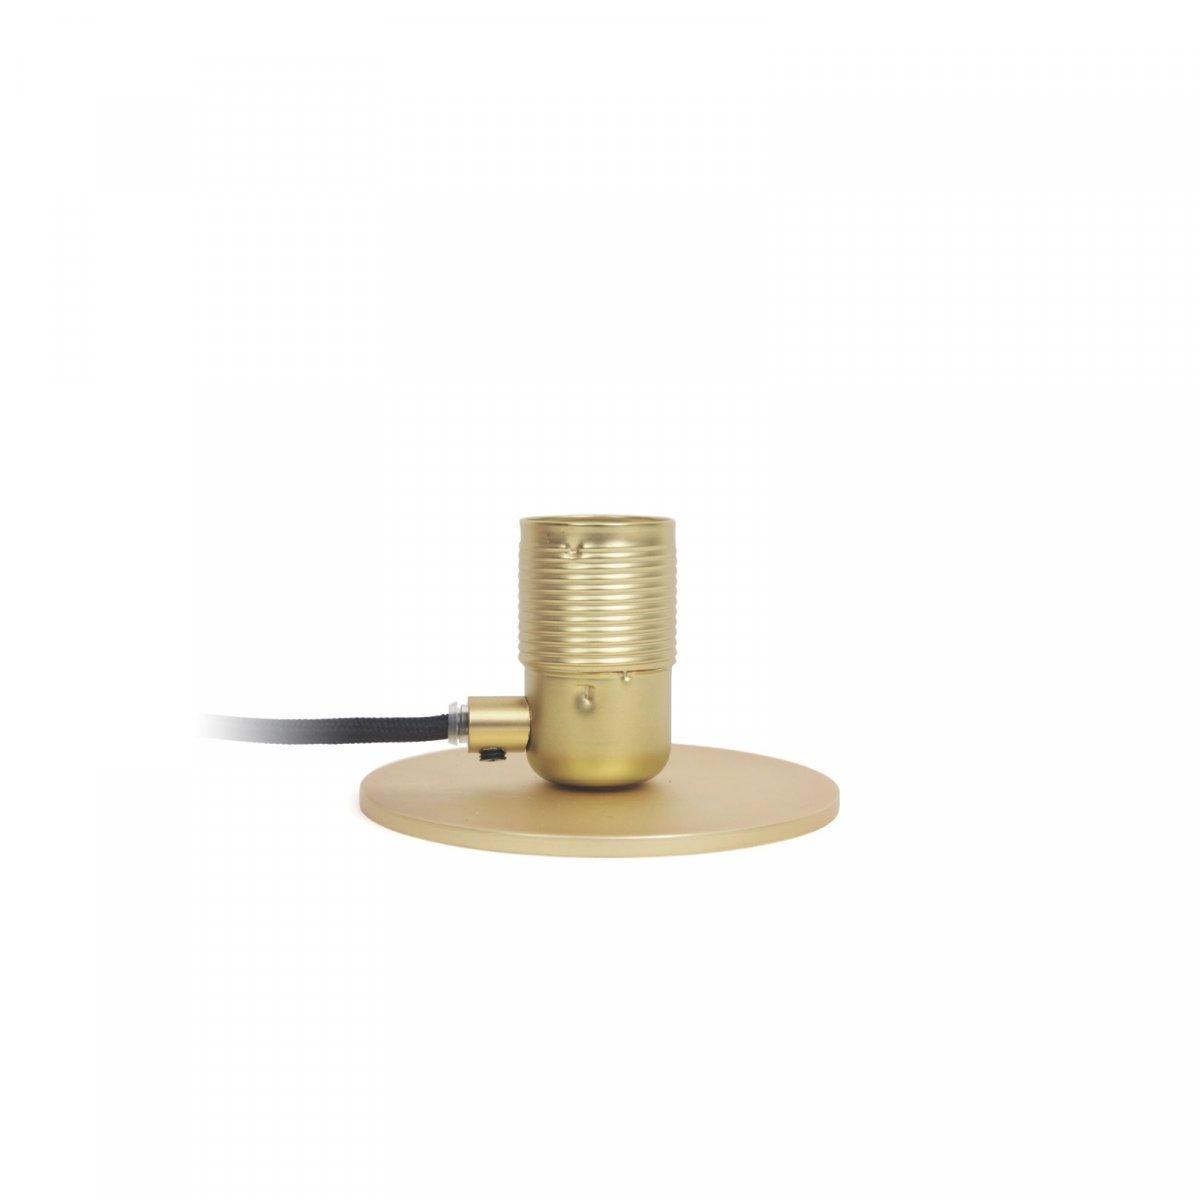 Frama E27 Table Light, brass.